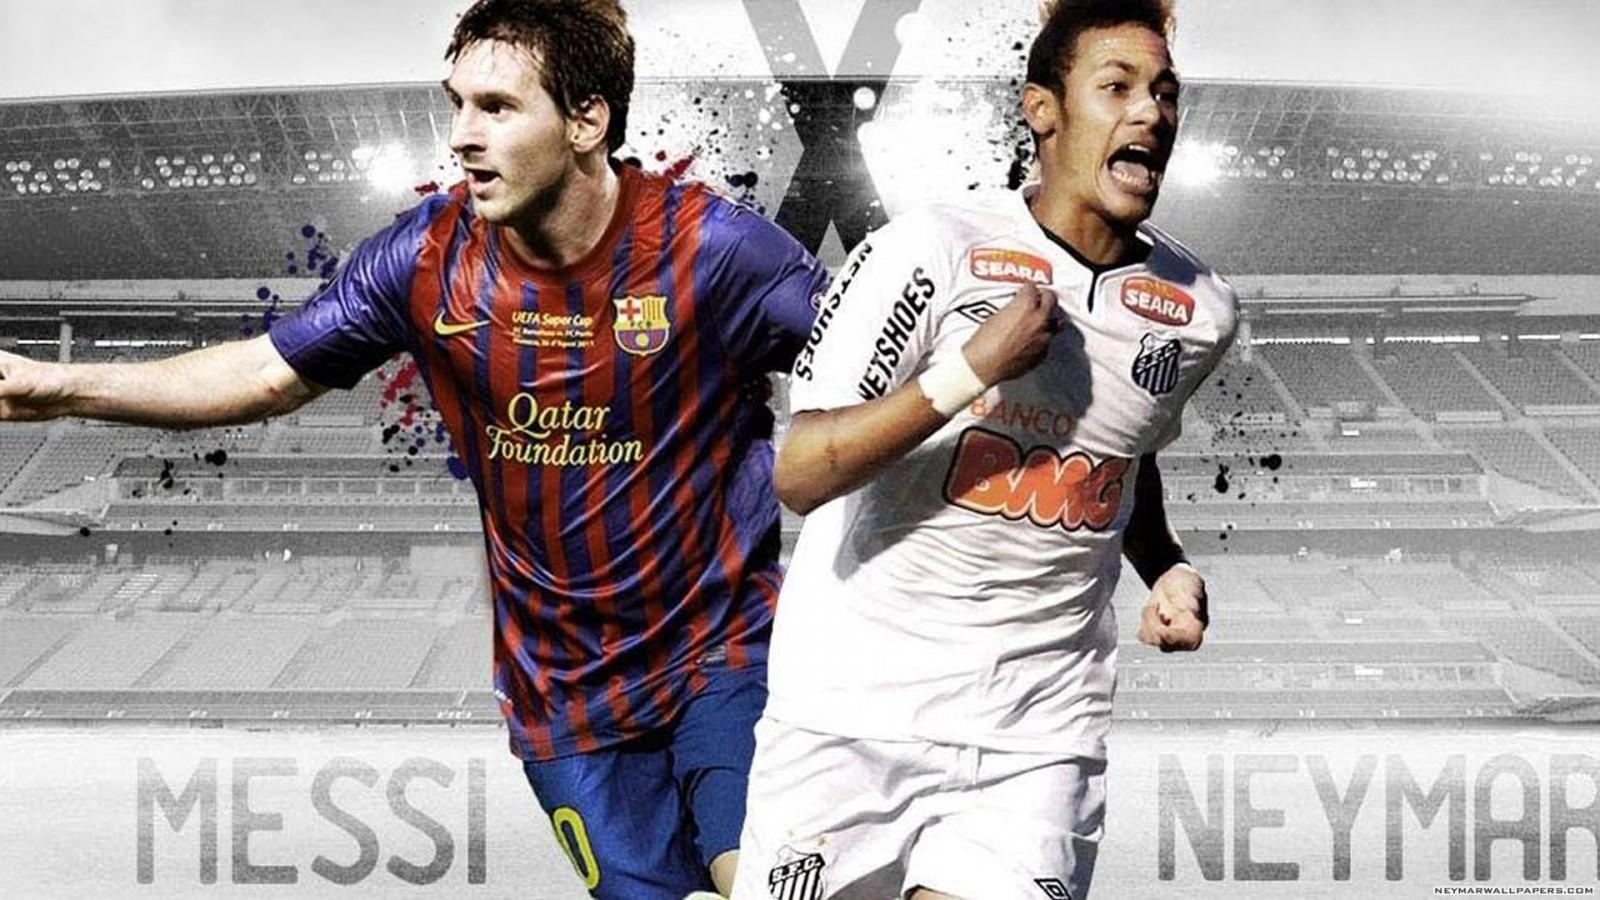 Messi Full Hd Wallpaper Neymar And Messi Wallpaper Neymar Wallpapers